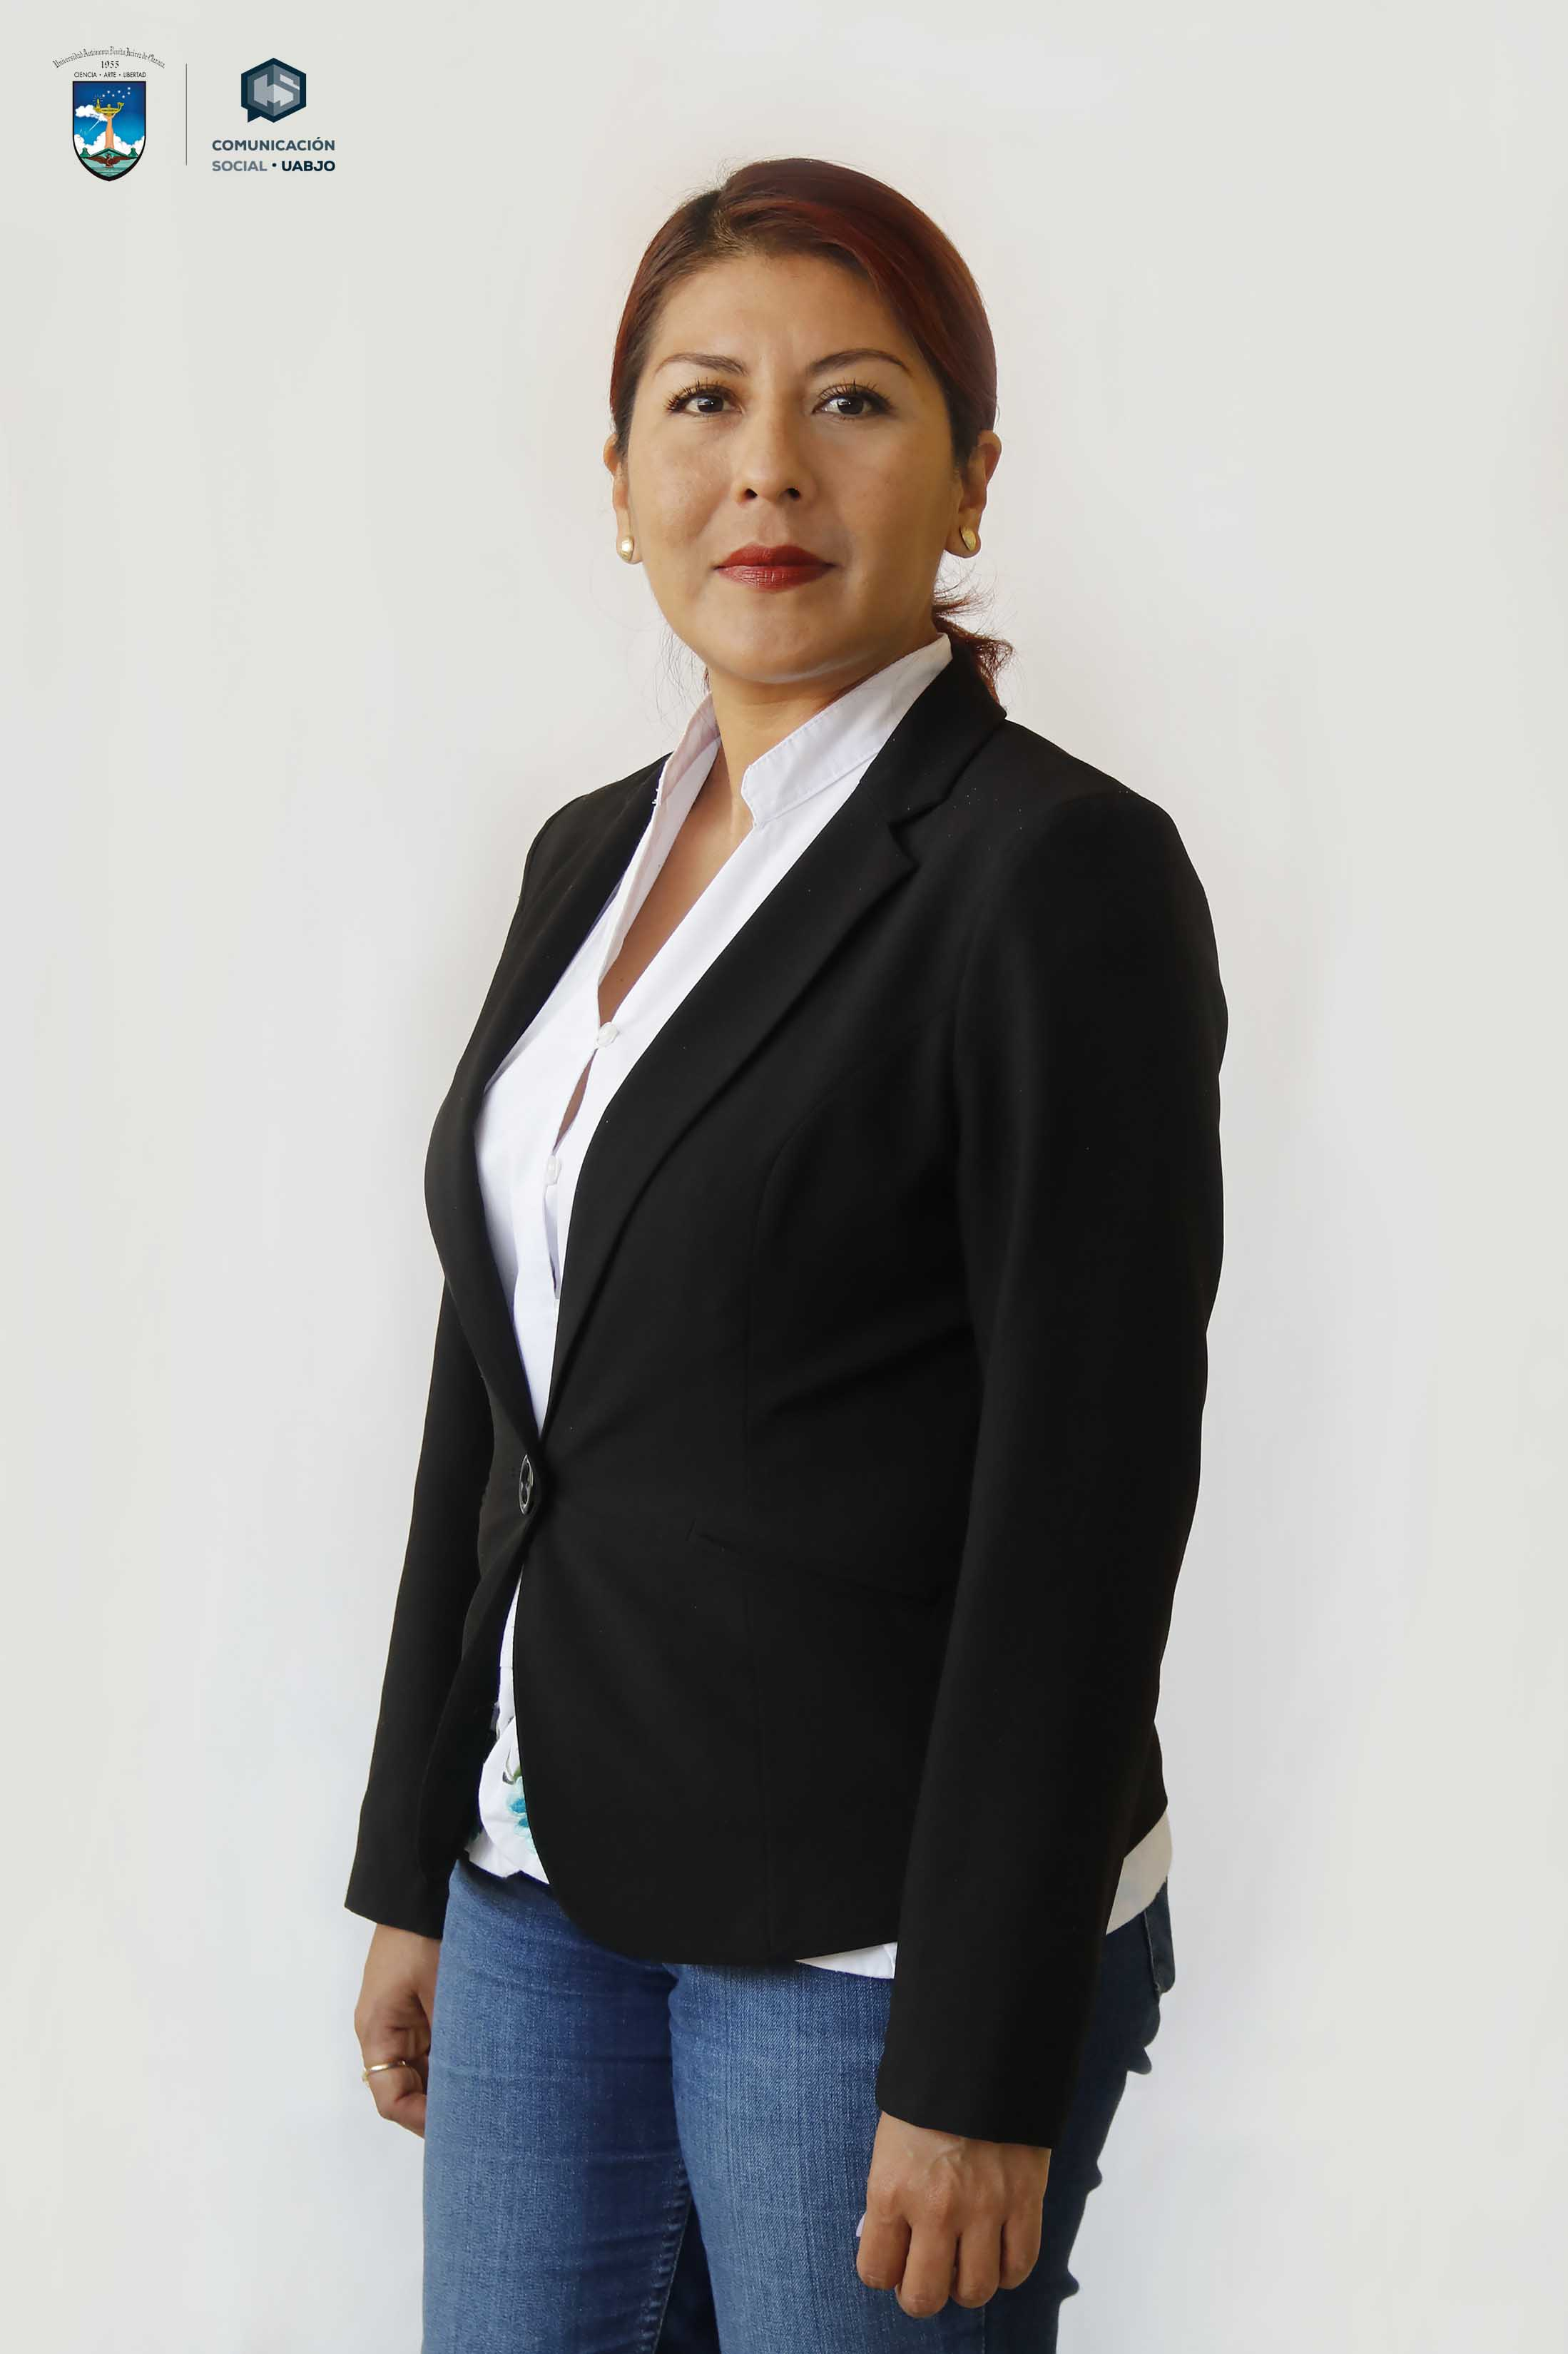 NIZ YAMILLE GOMEZ HERNANDEZ-DIRECTORA DIEG